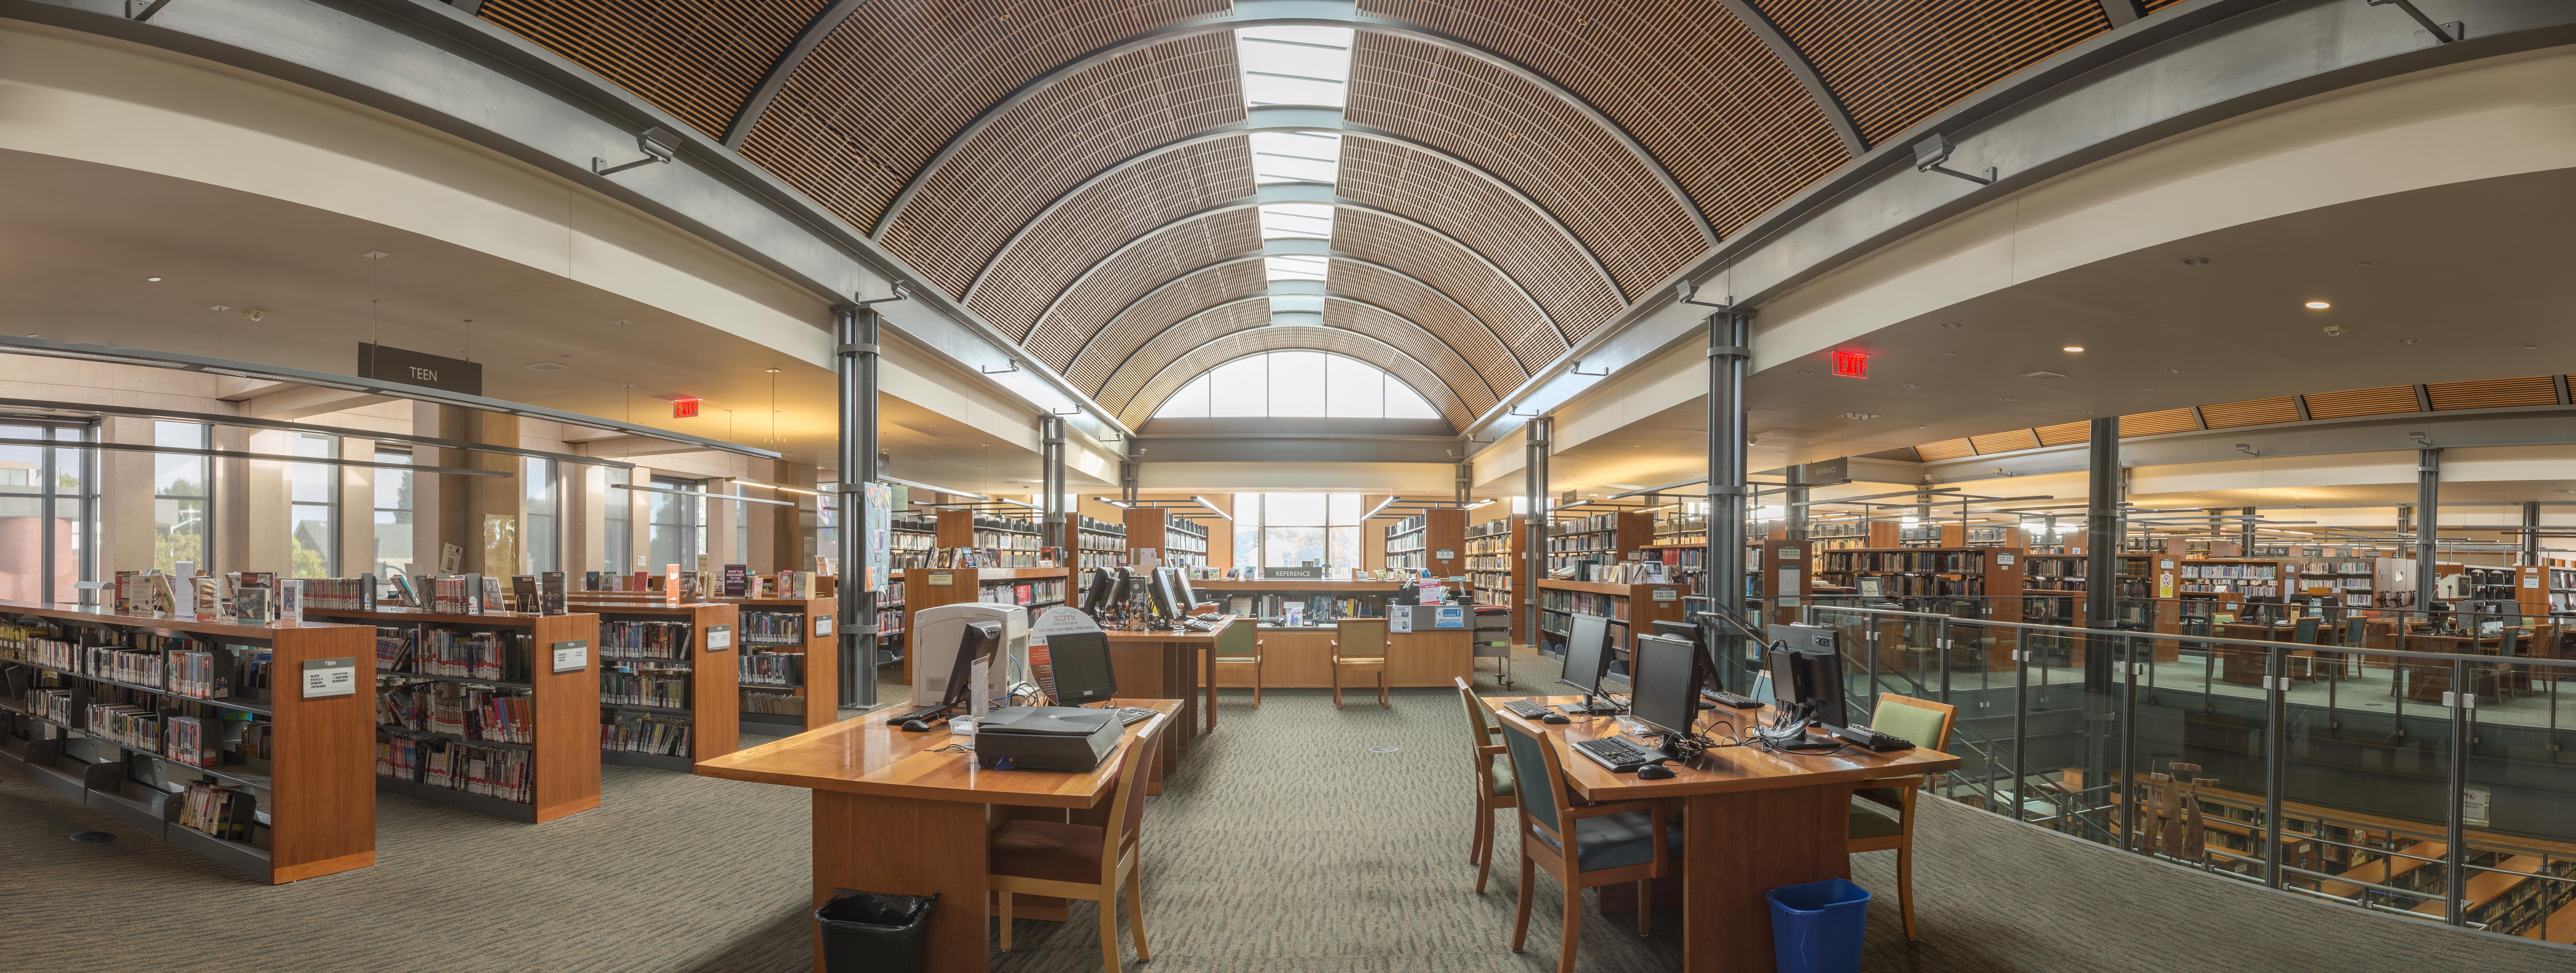 Home | Alameda Free Library